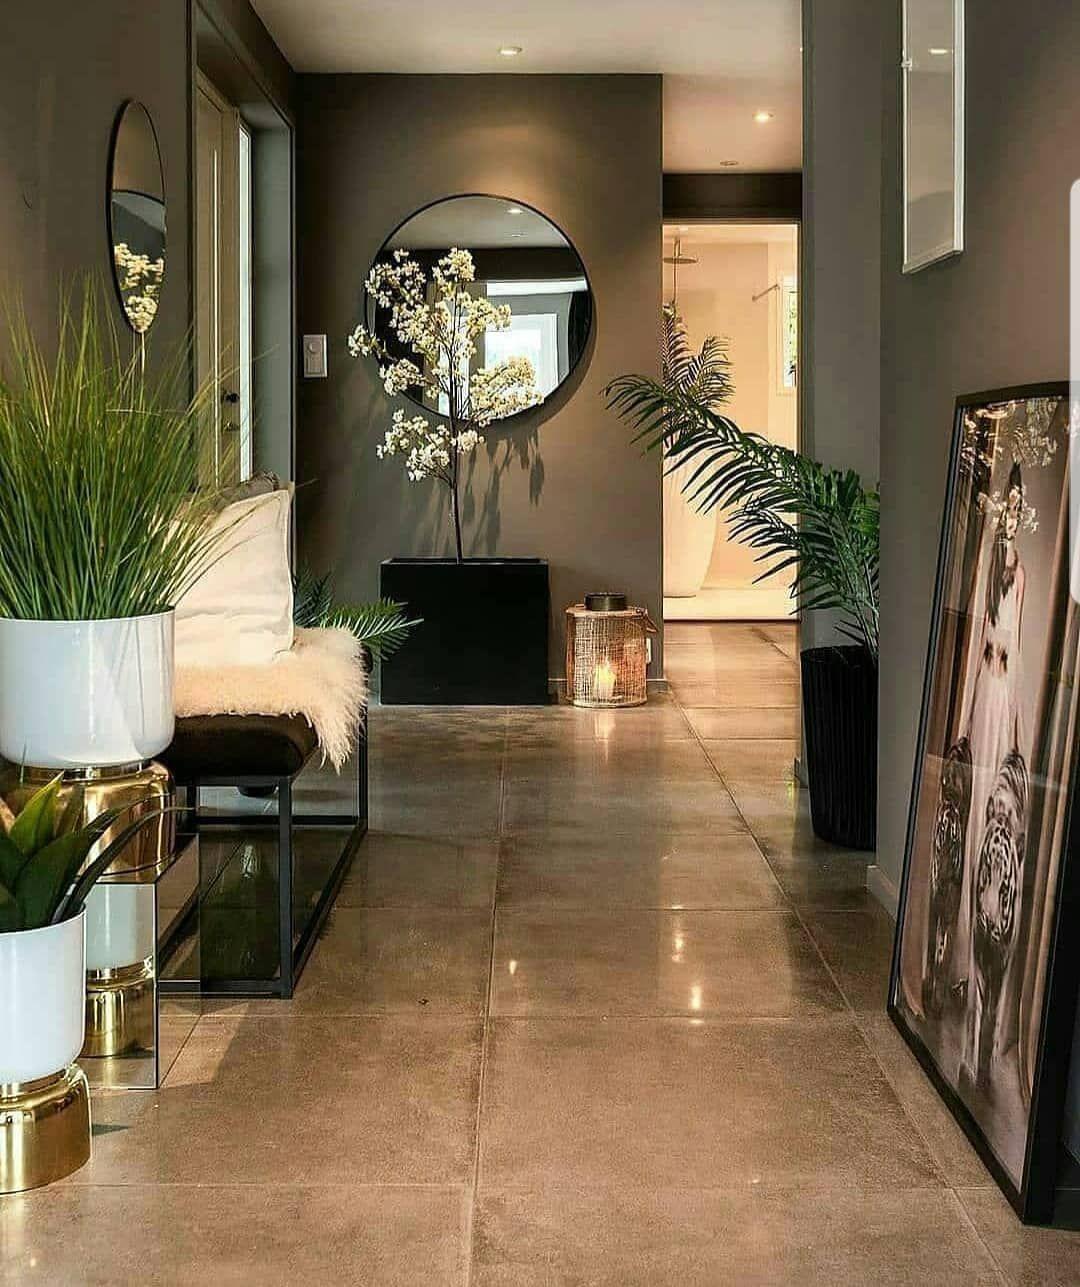 "𝗛𝗢𝗠𝗘 𝗗𝗘𝗦𝗜𝗚𝗡 on Instagram: ""Credits 📷 @stylebymll #interior_design #interior #interior4all #home_design68"""